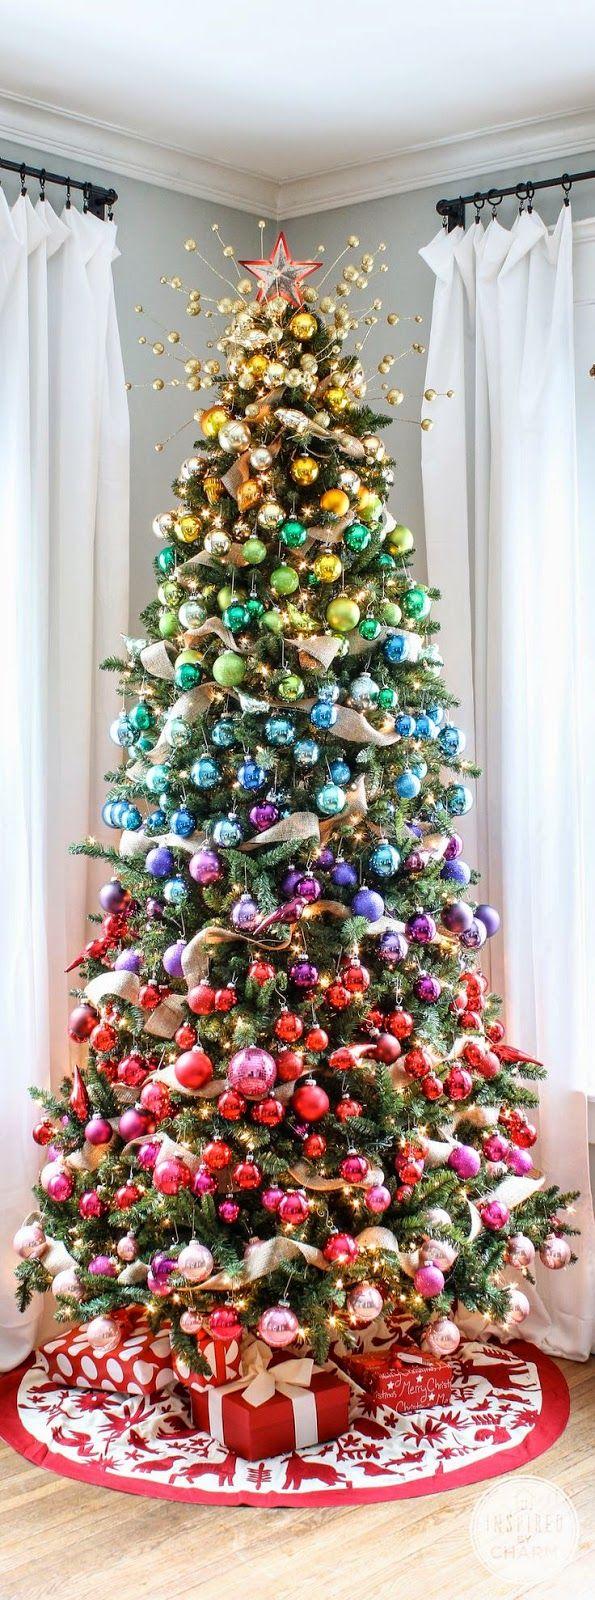 A Colorful Christmas Tree